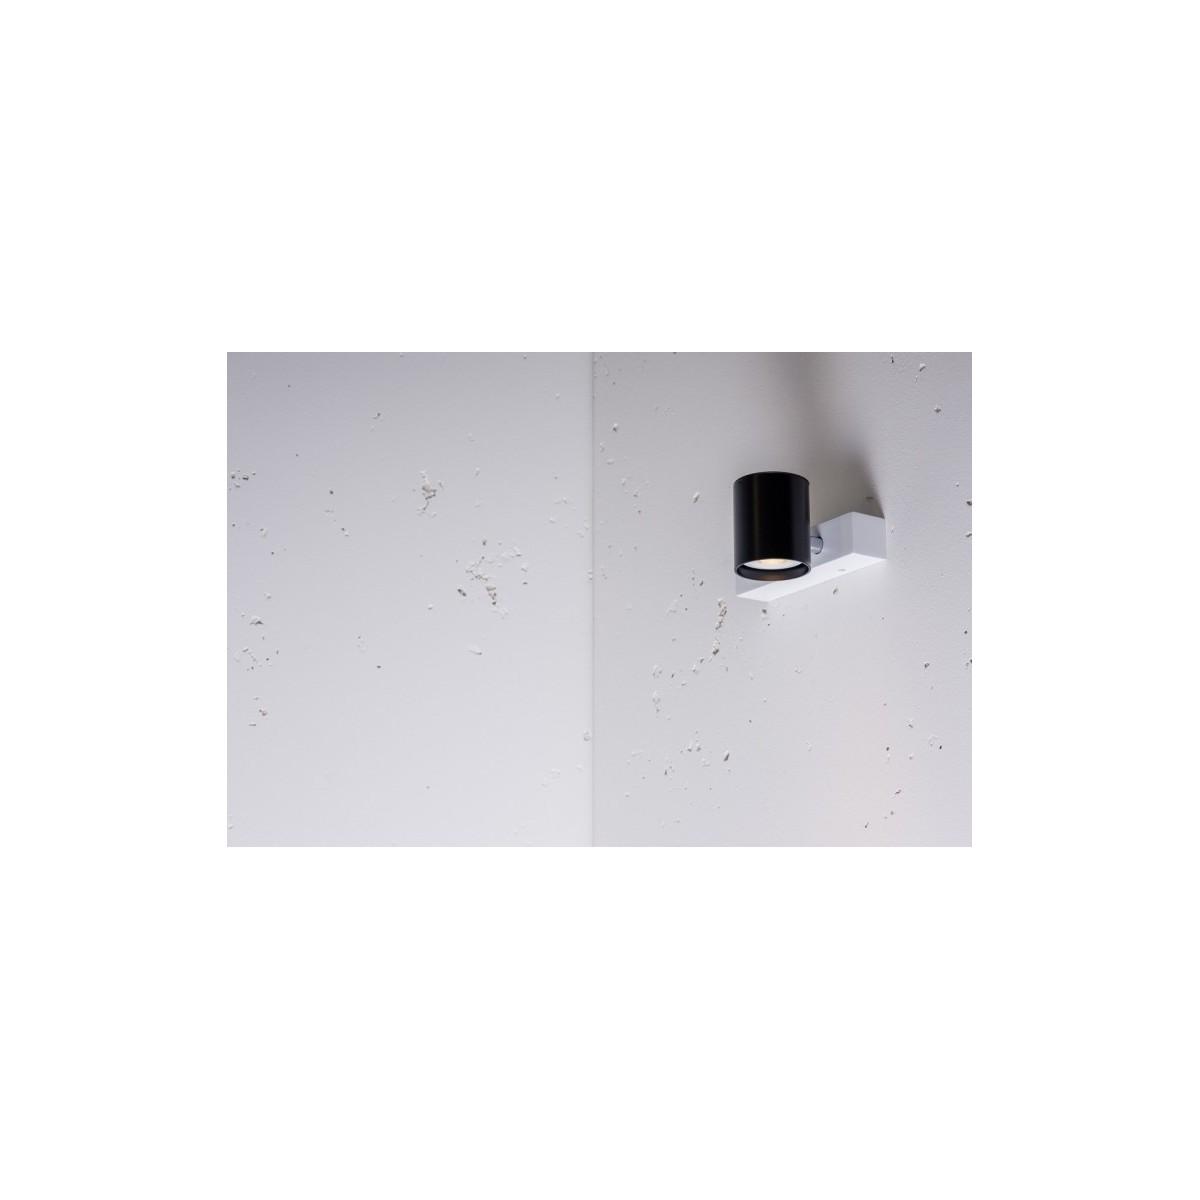 Labra Kiko R 1-0267 Kinkiet